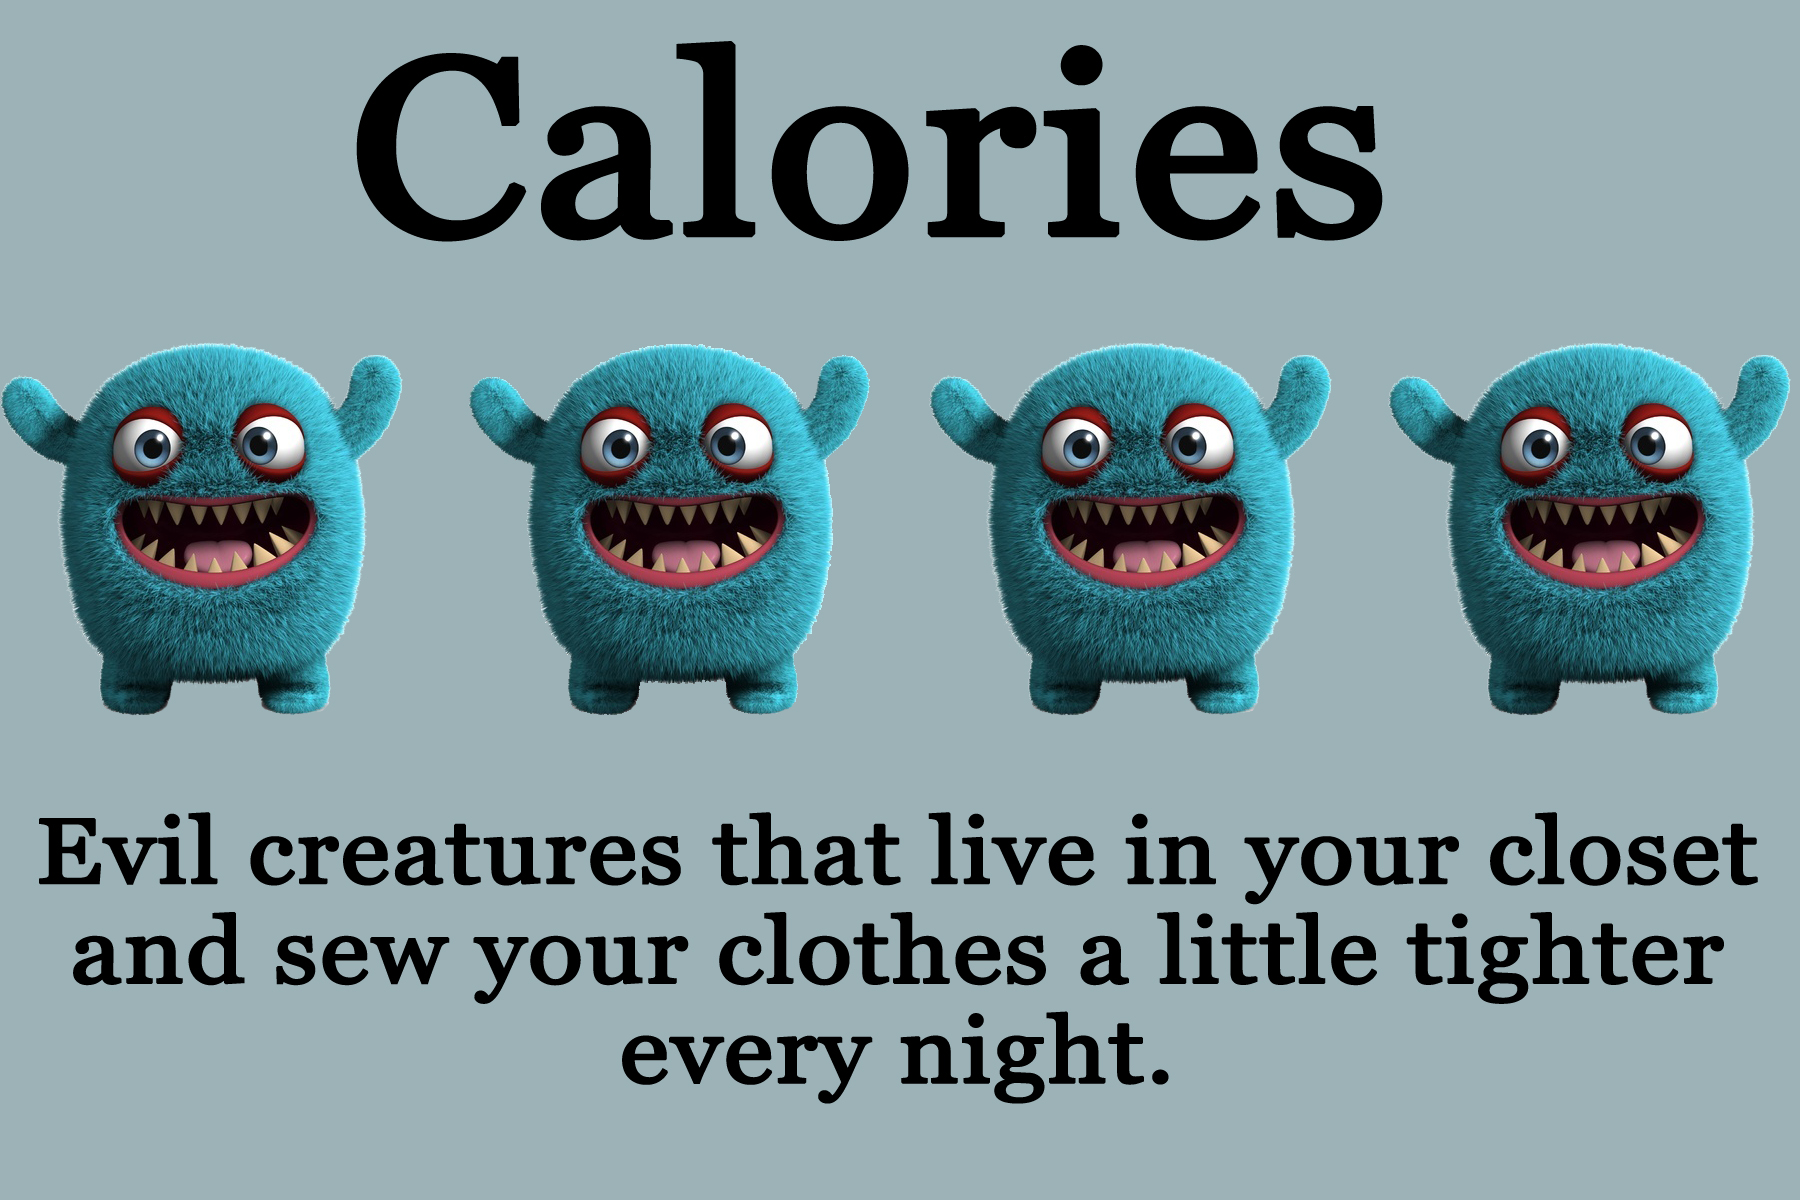 Calories_meme